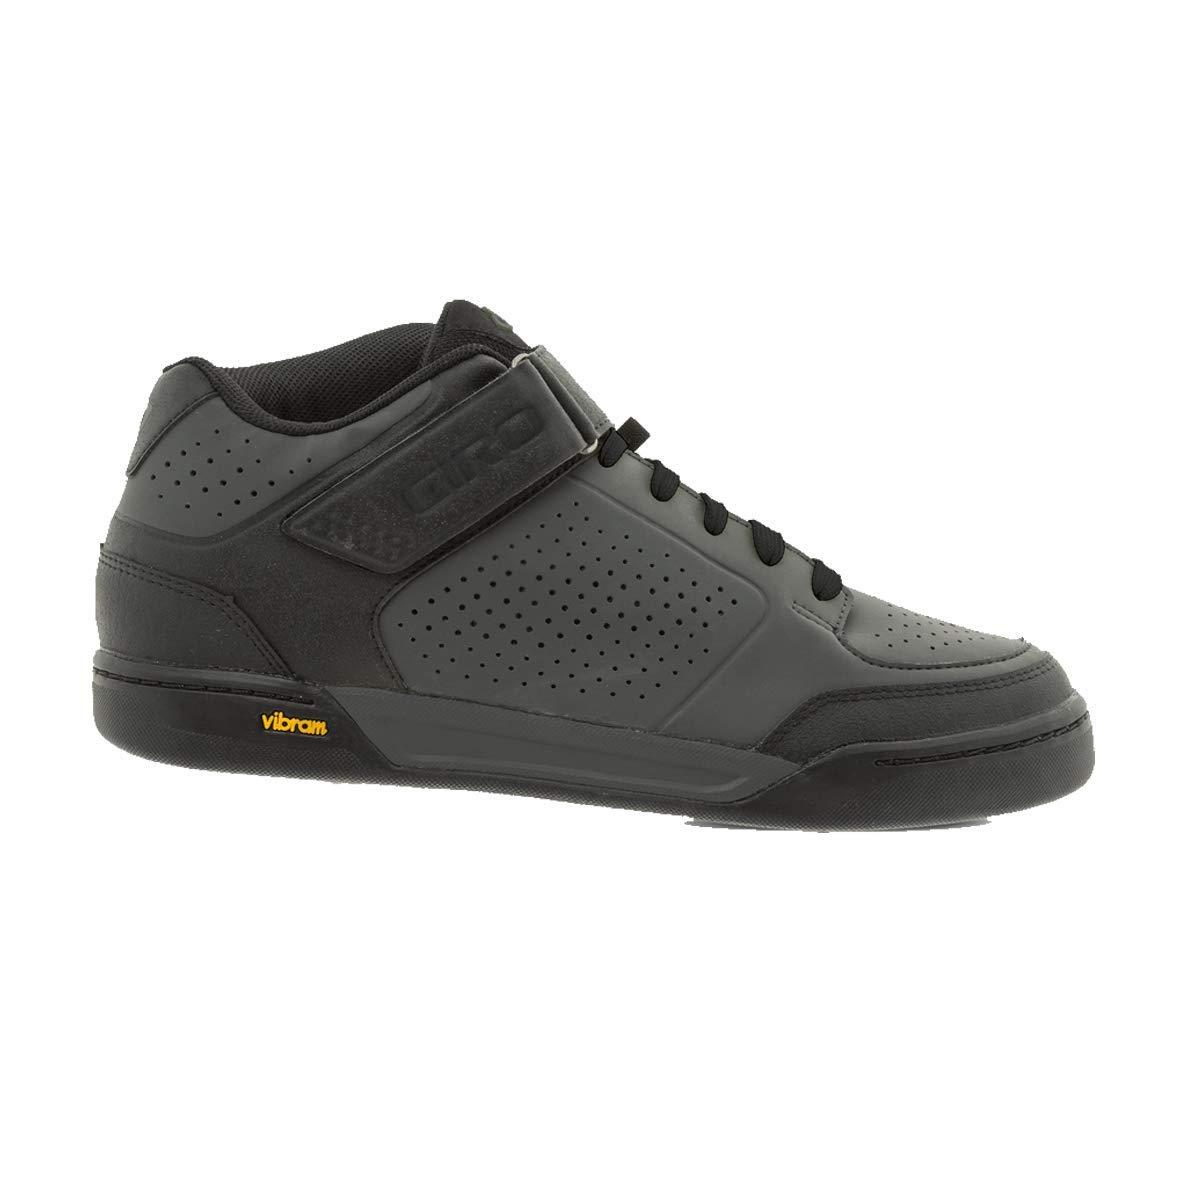 /Chaussures Homme/ Giro Rotation Riddance Mid/ /Gris//Noir 2019/